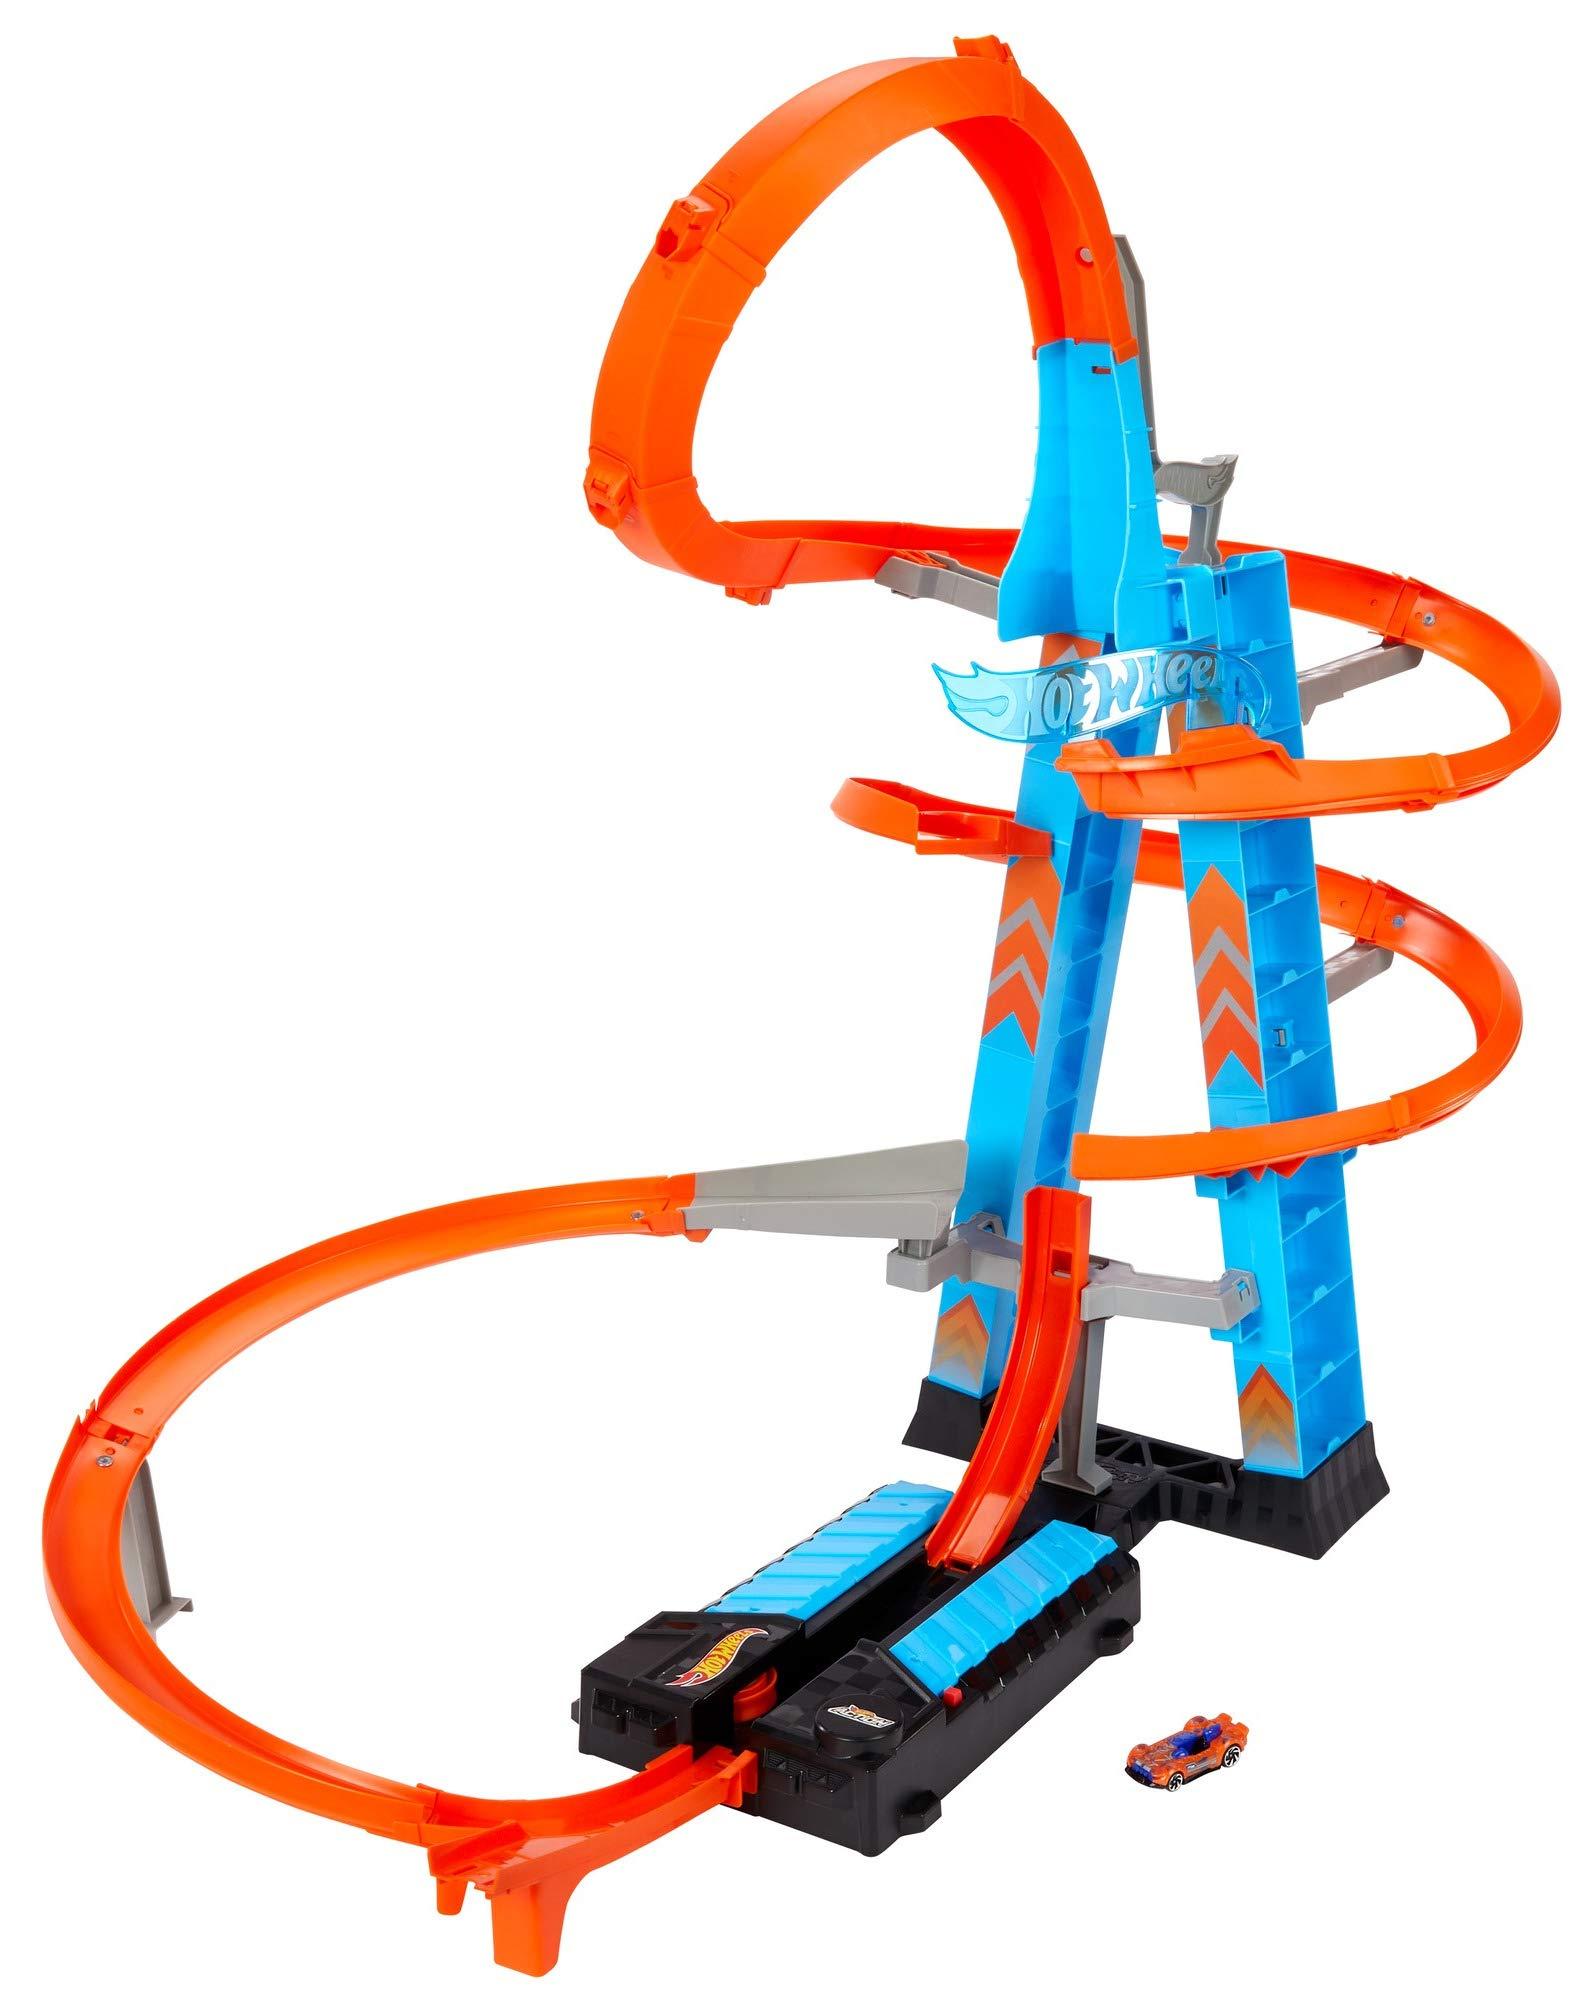 Hot Wheels Sky Crash Tower, track set